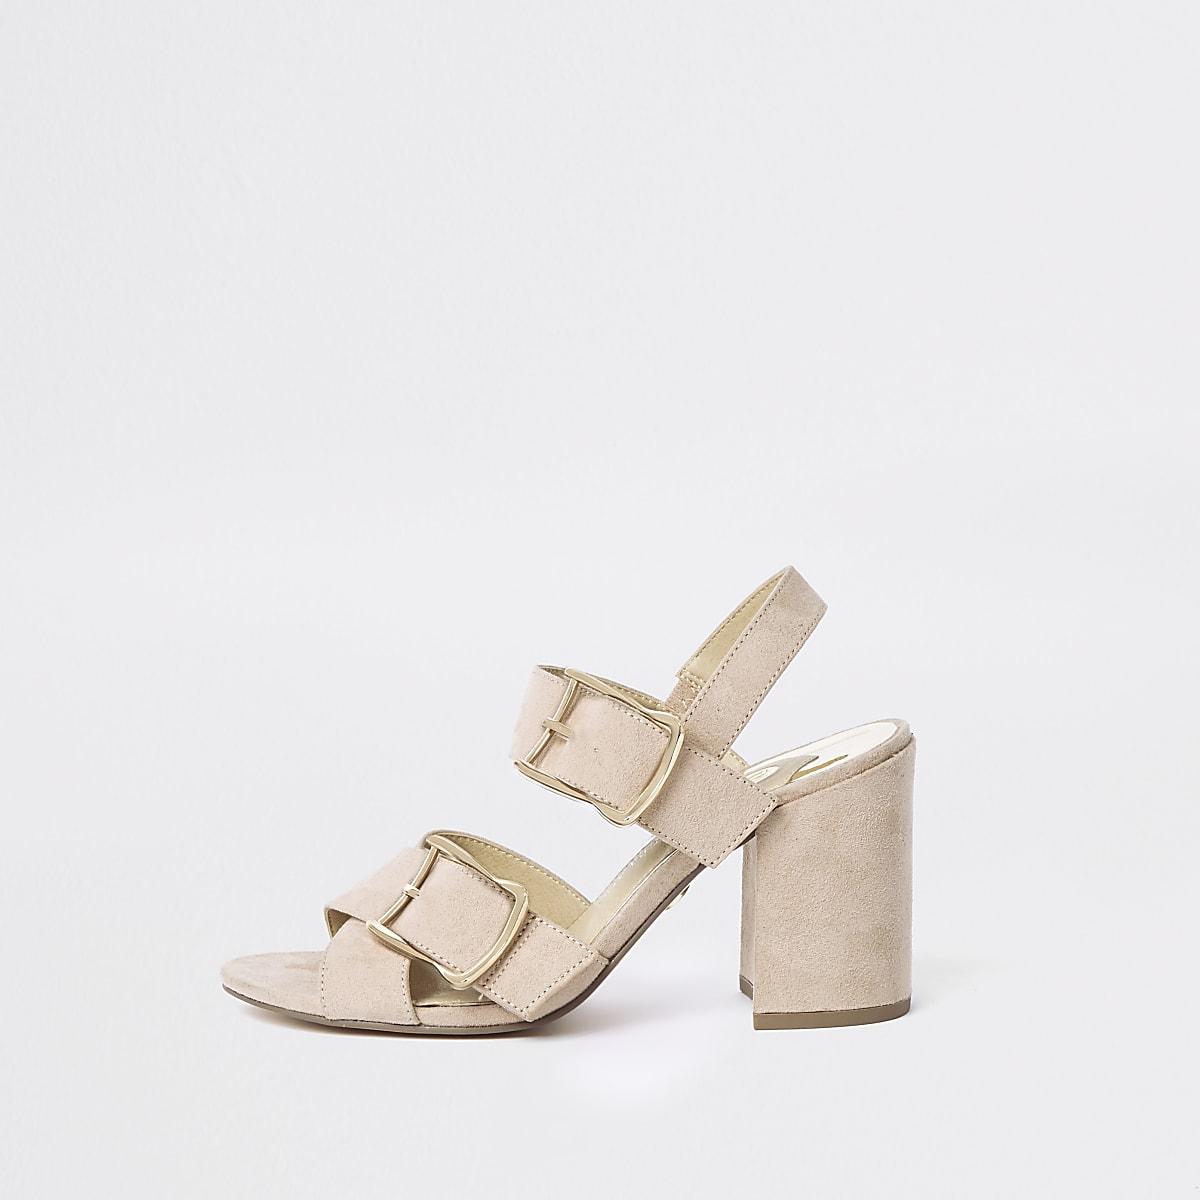 c65be308052d Pink block heel sandals - Sandals - Shoes   Boots - women